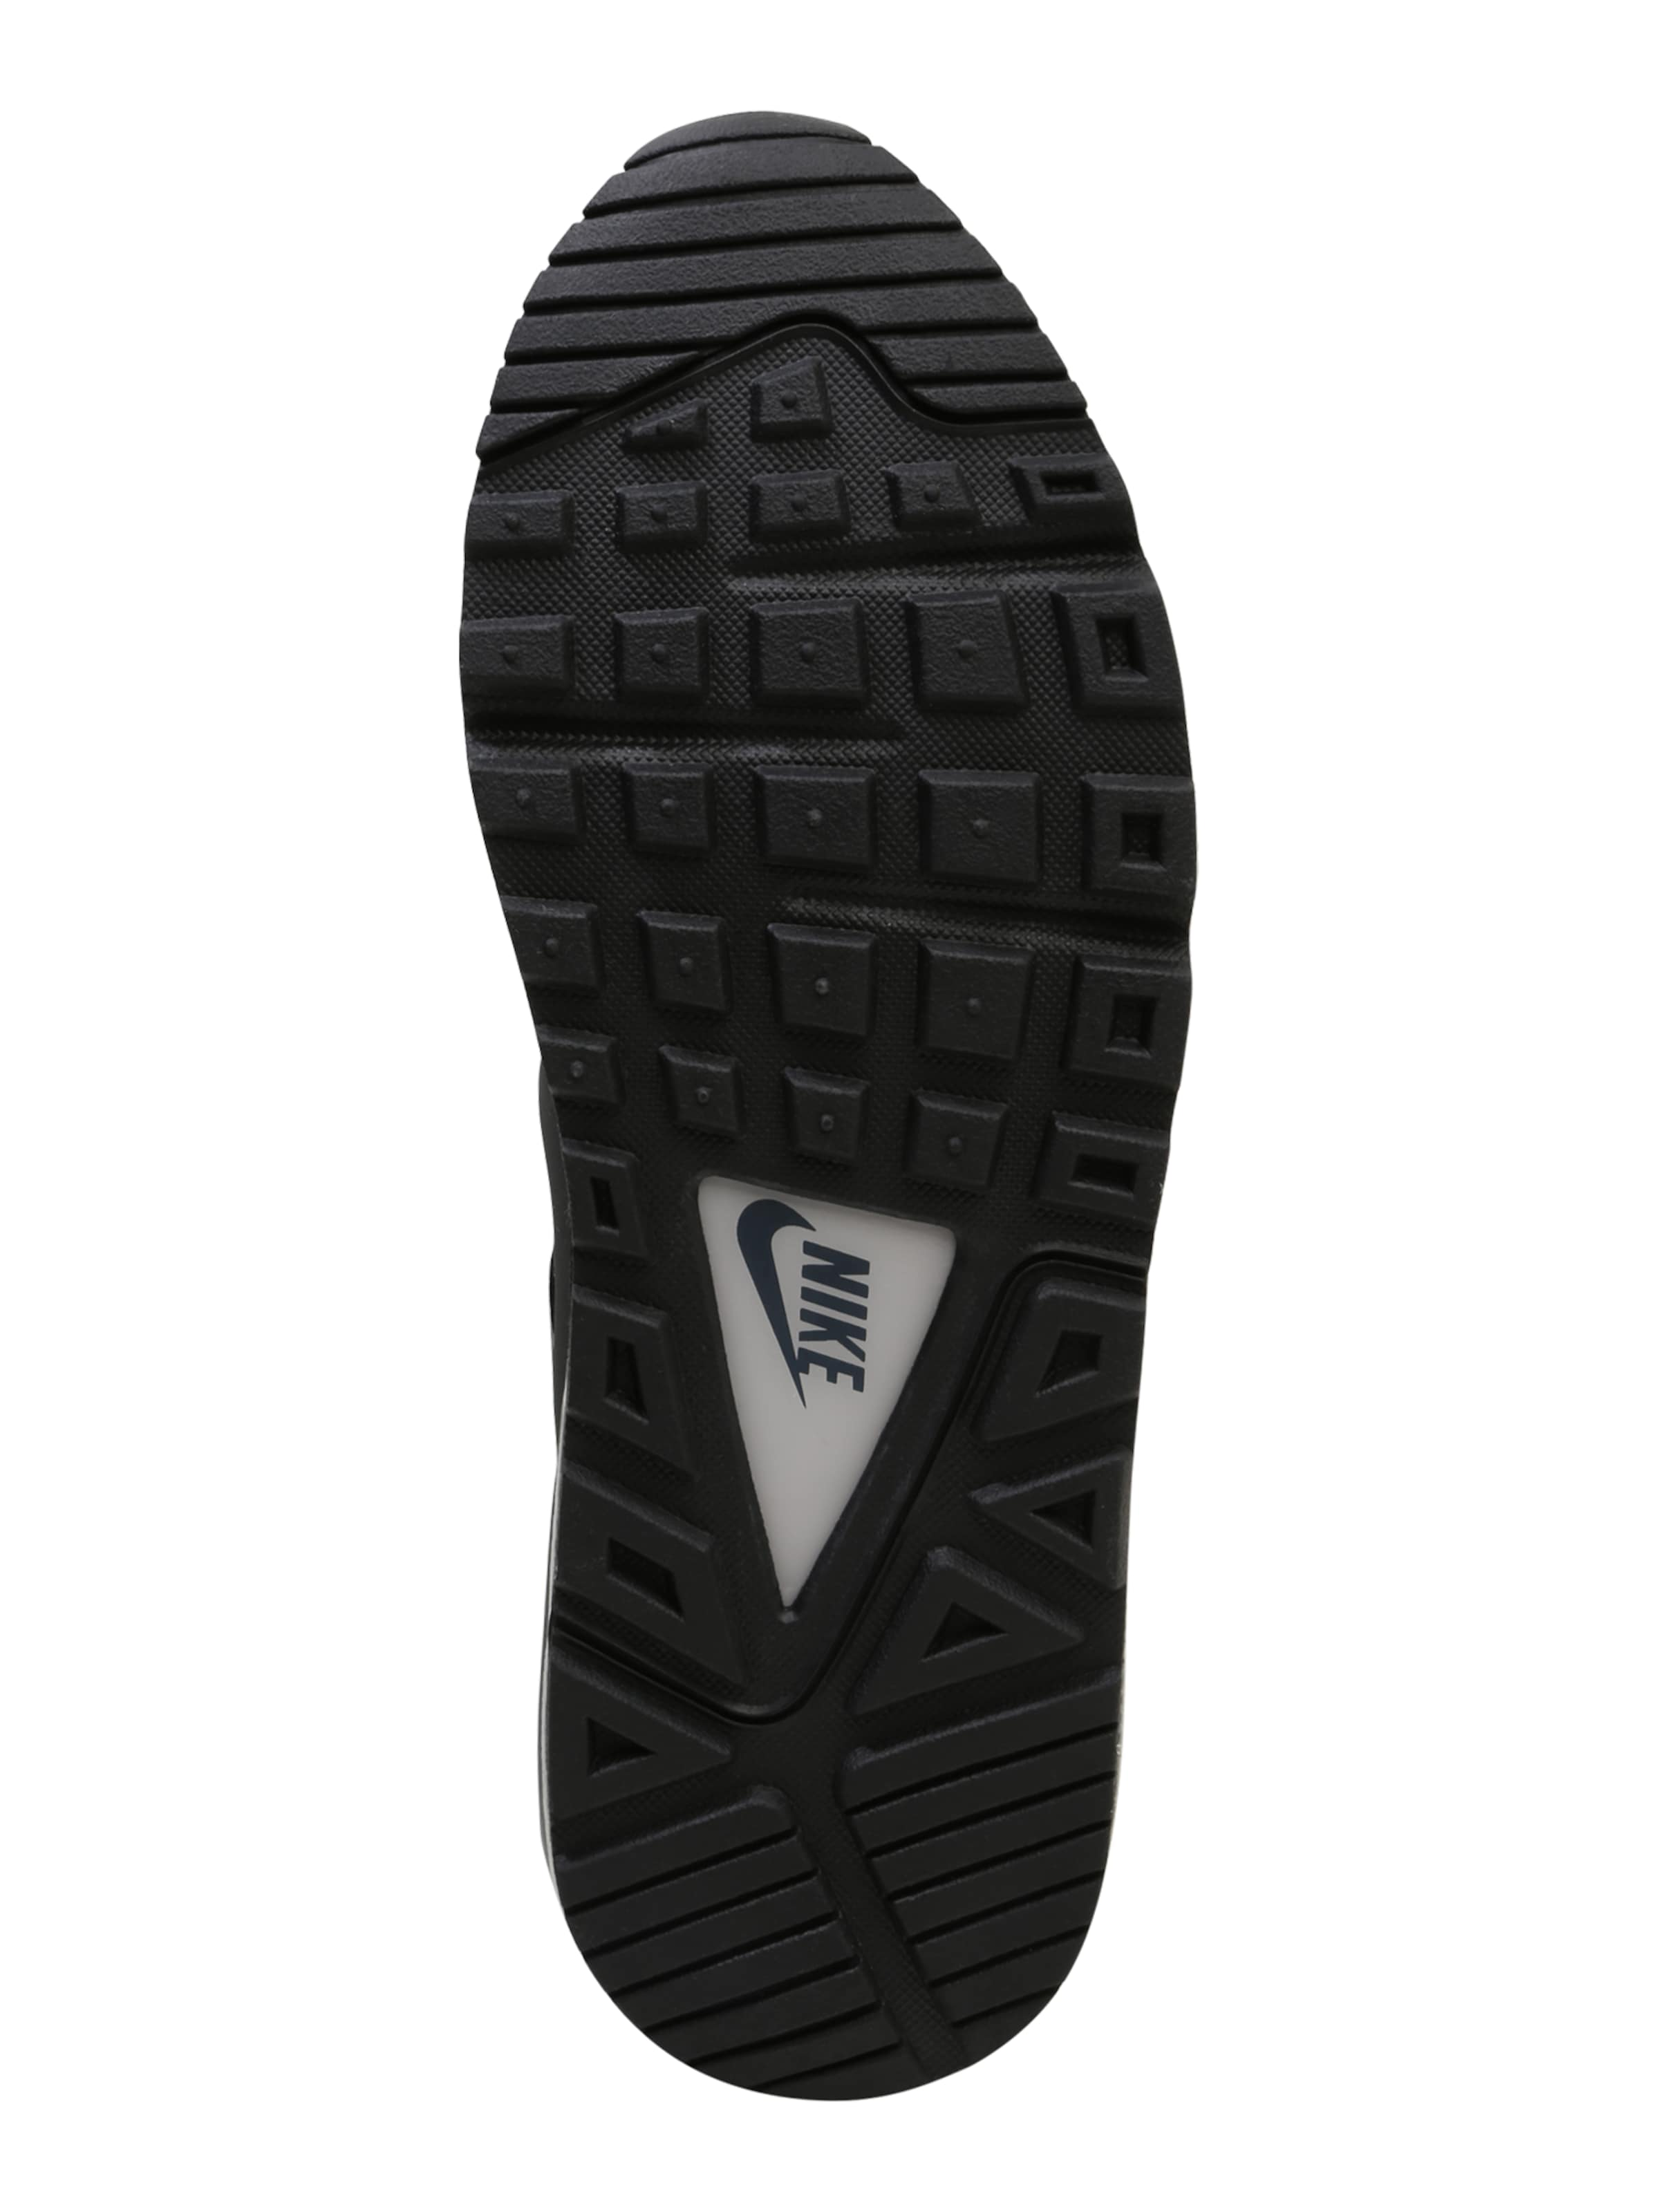 SchwarzOffwhite Nike Max Sneaker Command' Sportswear In 'air 9eEWYD2HI